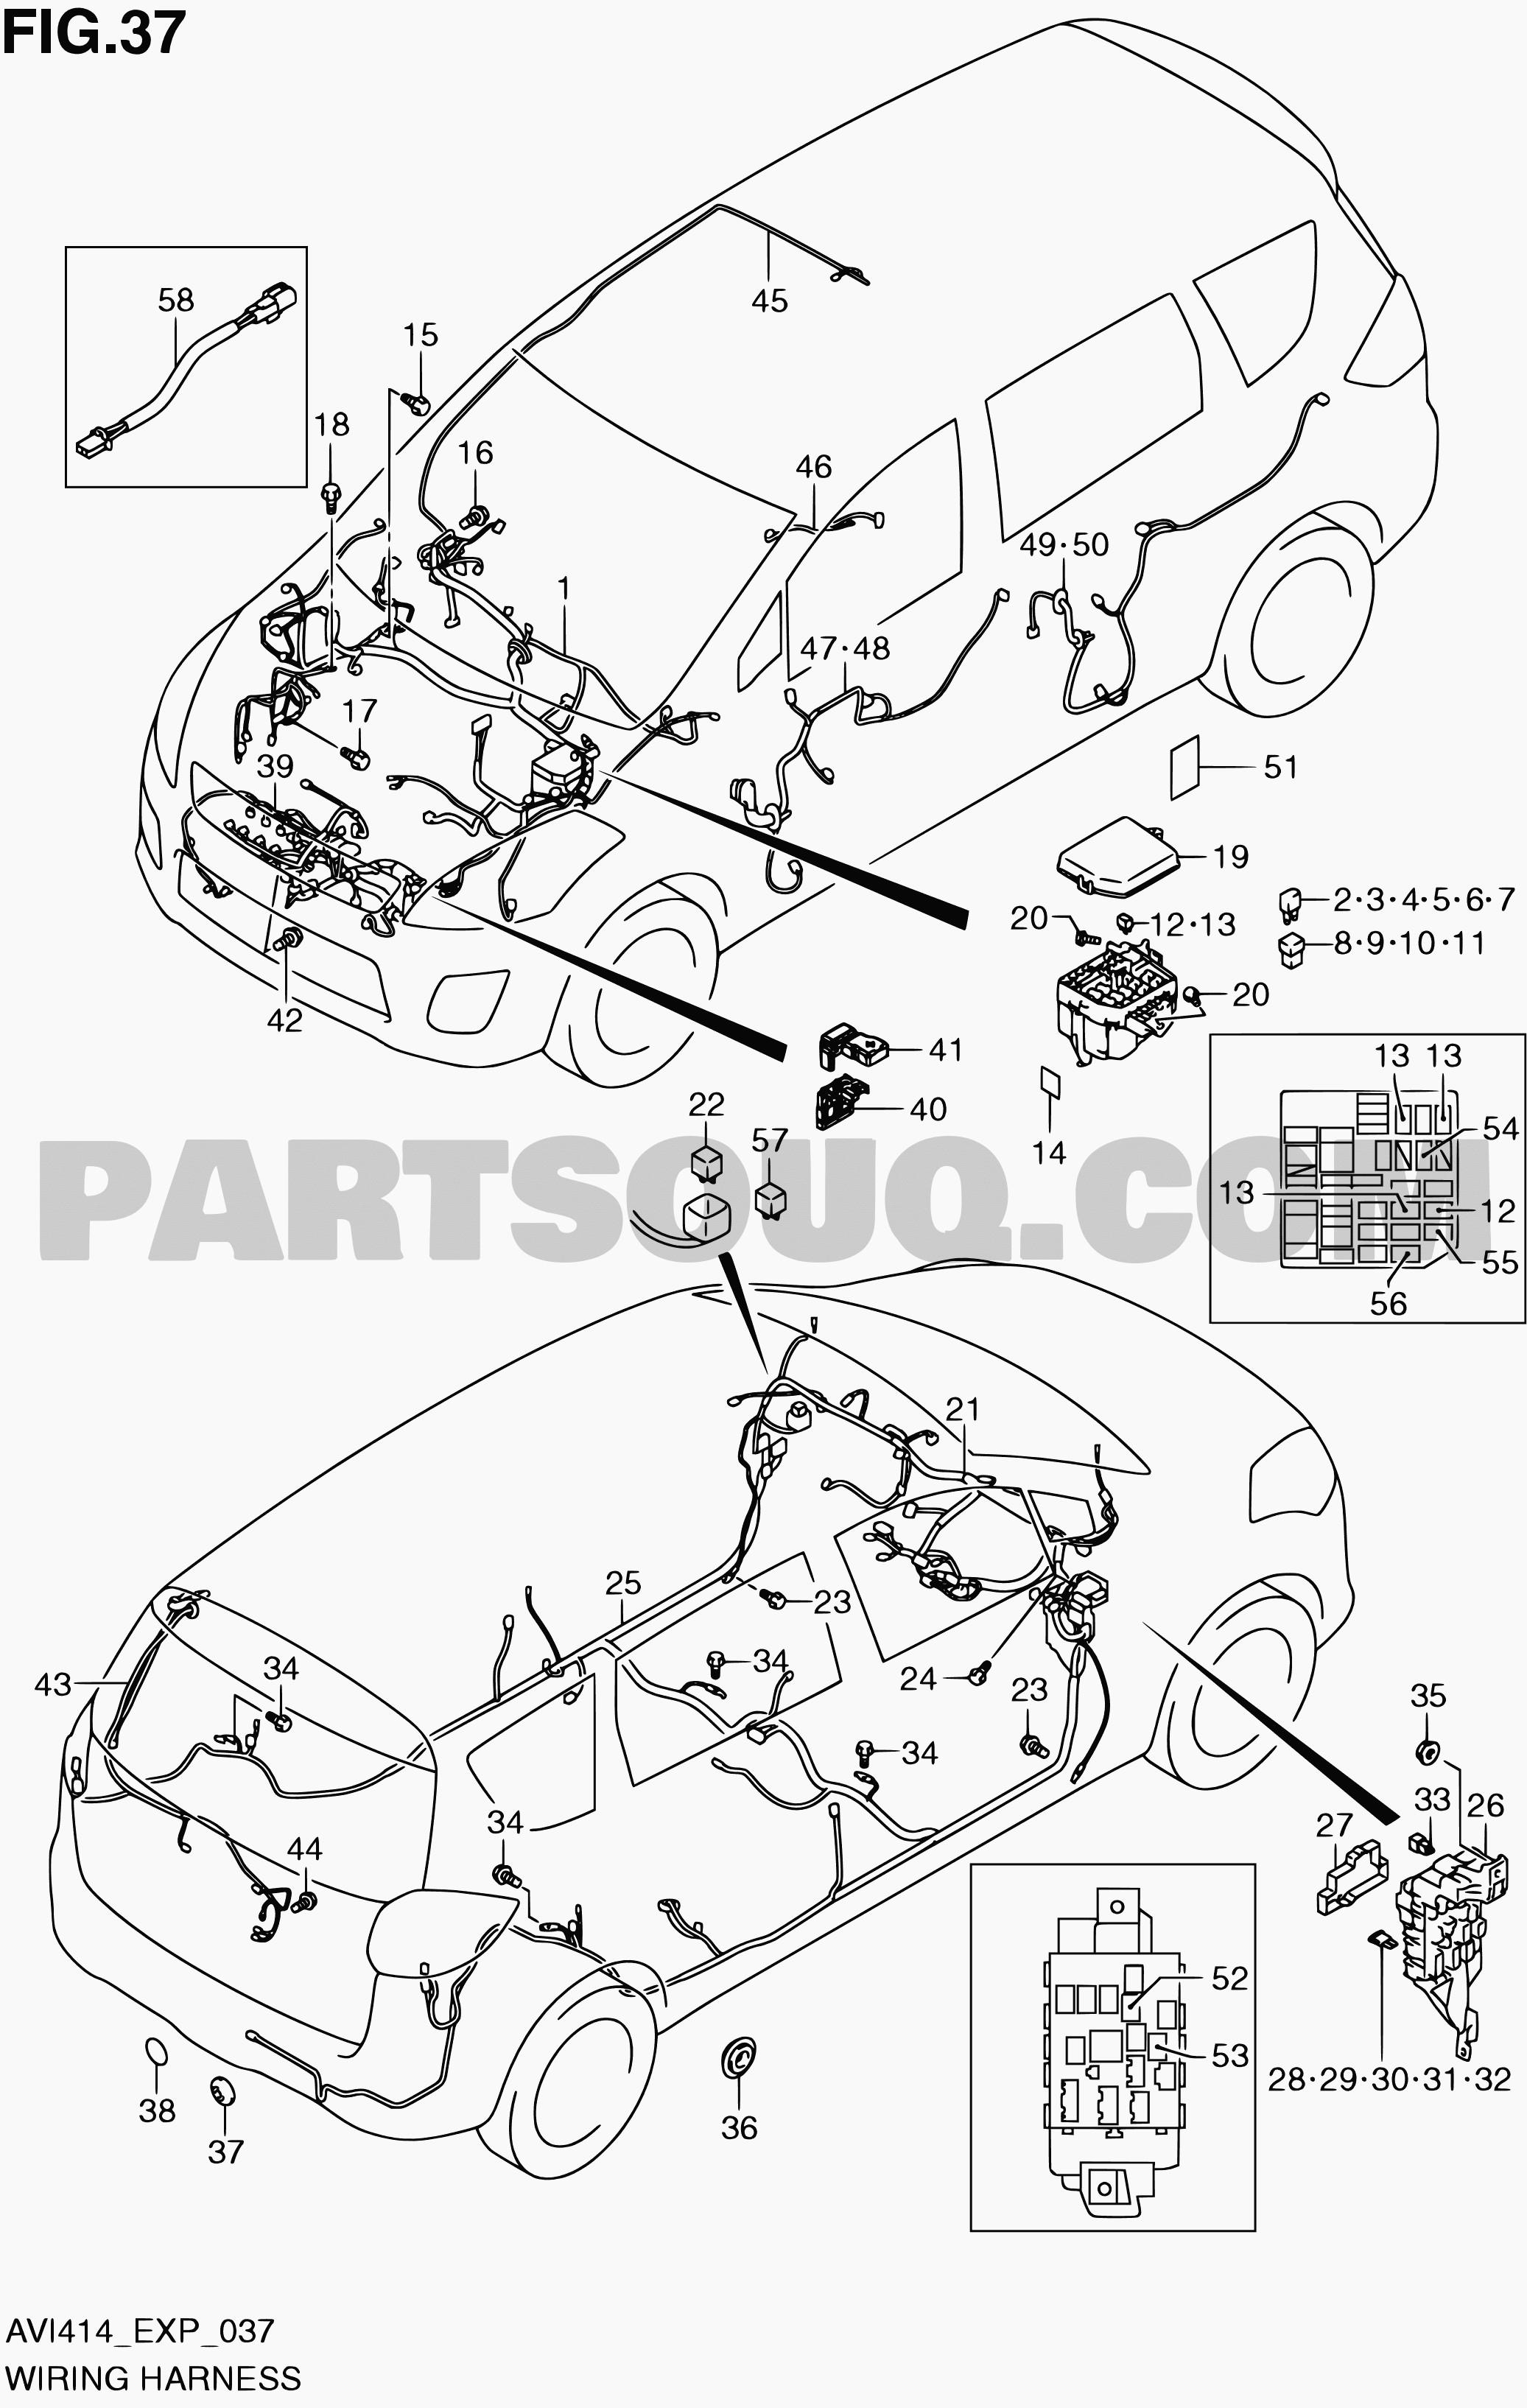 Diagram Of Car Parts In Spanish 2014 2017 Ek19 Automatic 6l80e Transmission Wiring 37 Harness Ertiga Avi414 P06 P85